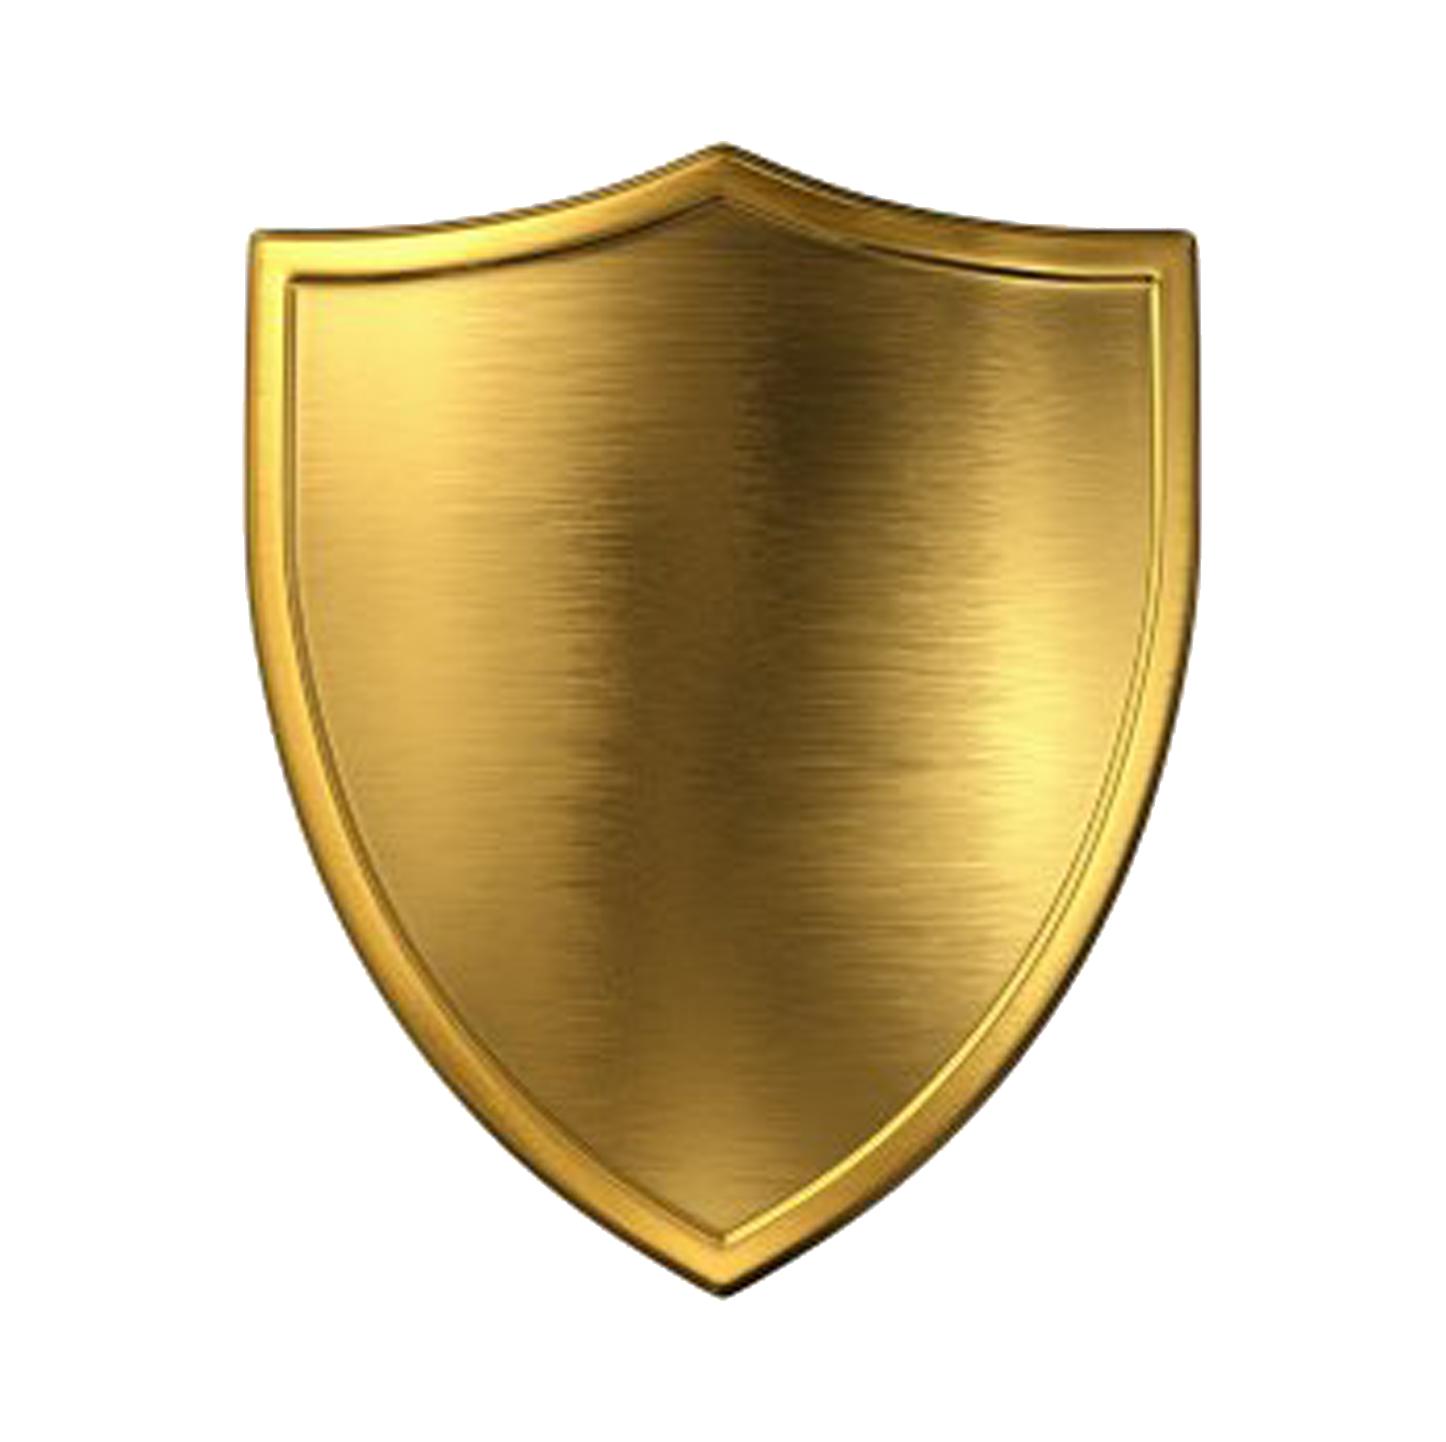 Free download clip art. Clipart shield school